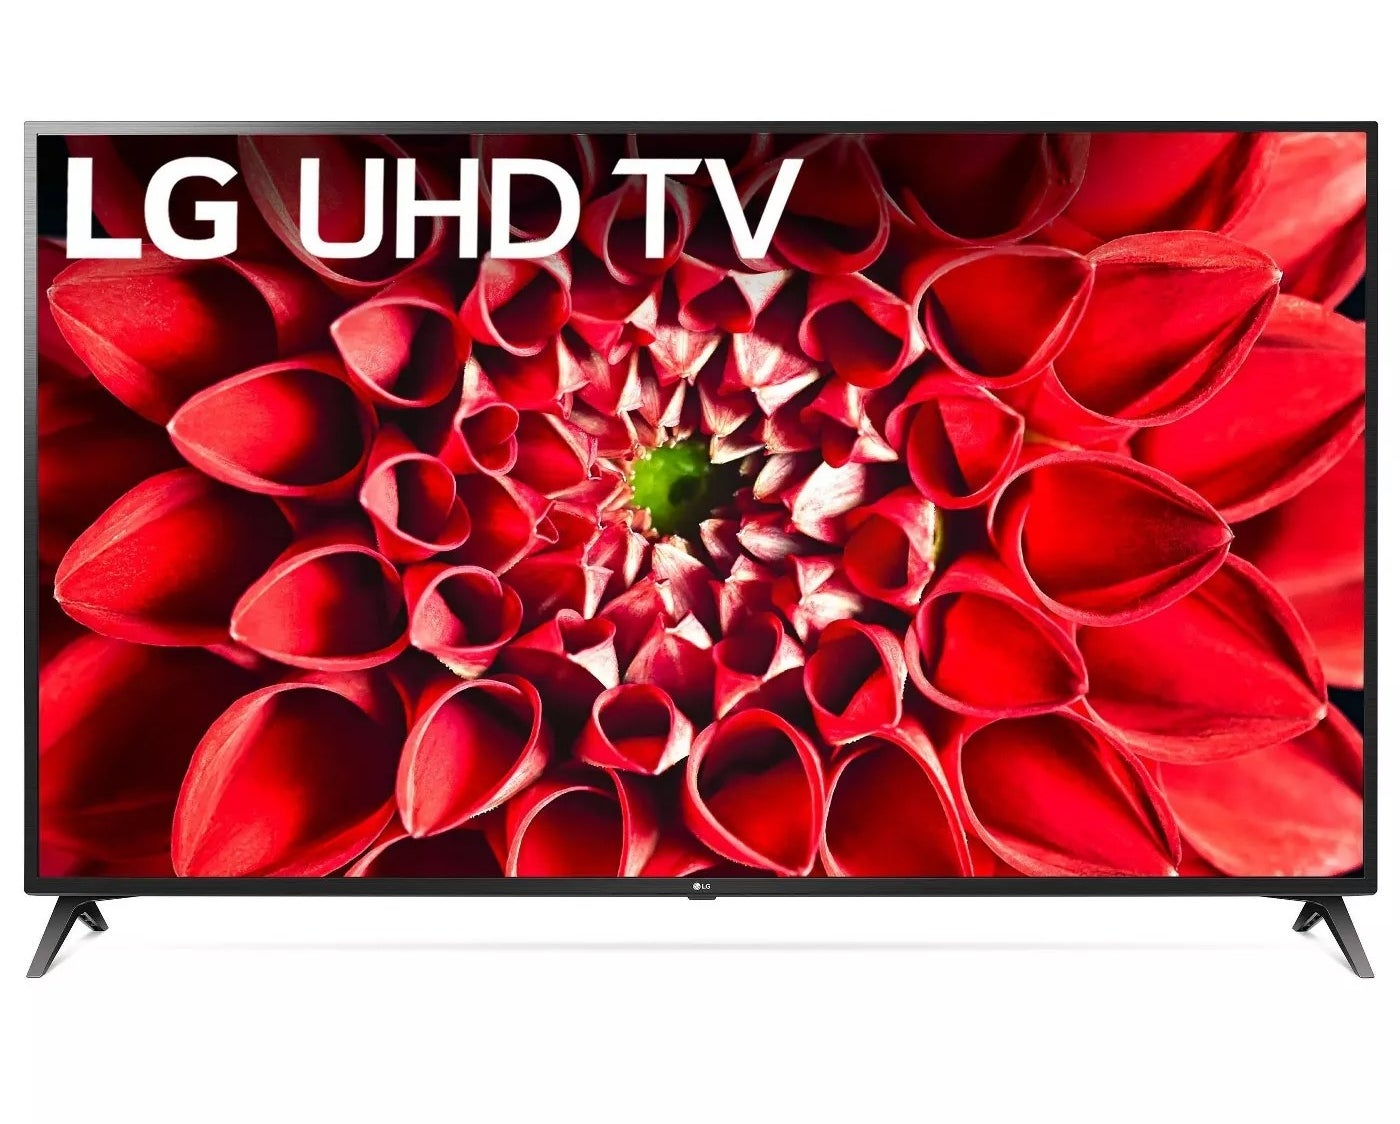 The LG UHD TV